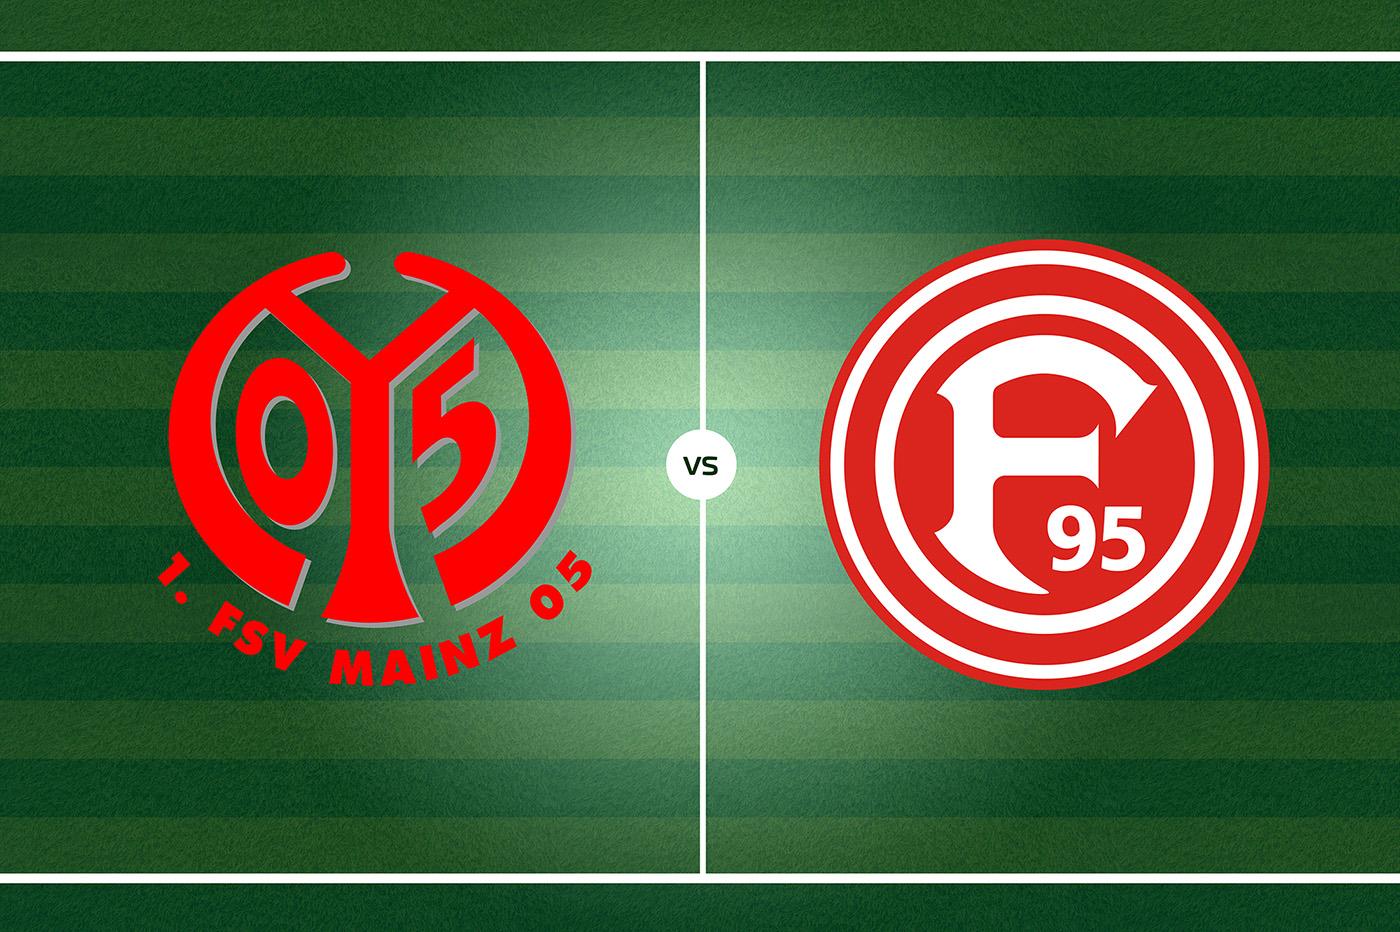 Football Bundesliga 1 Fsv Mainz 05 Vs Fortuna Dusseldorf